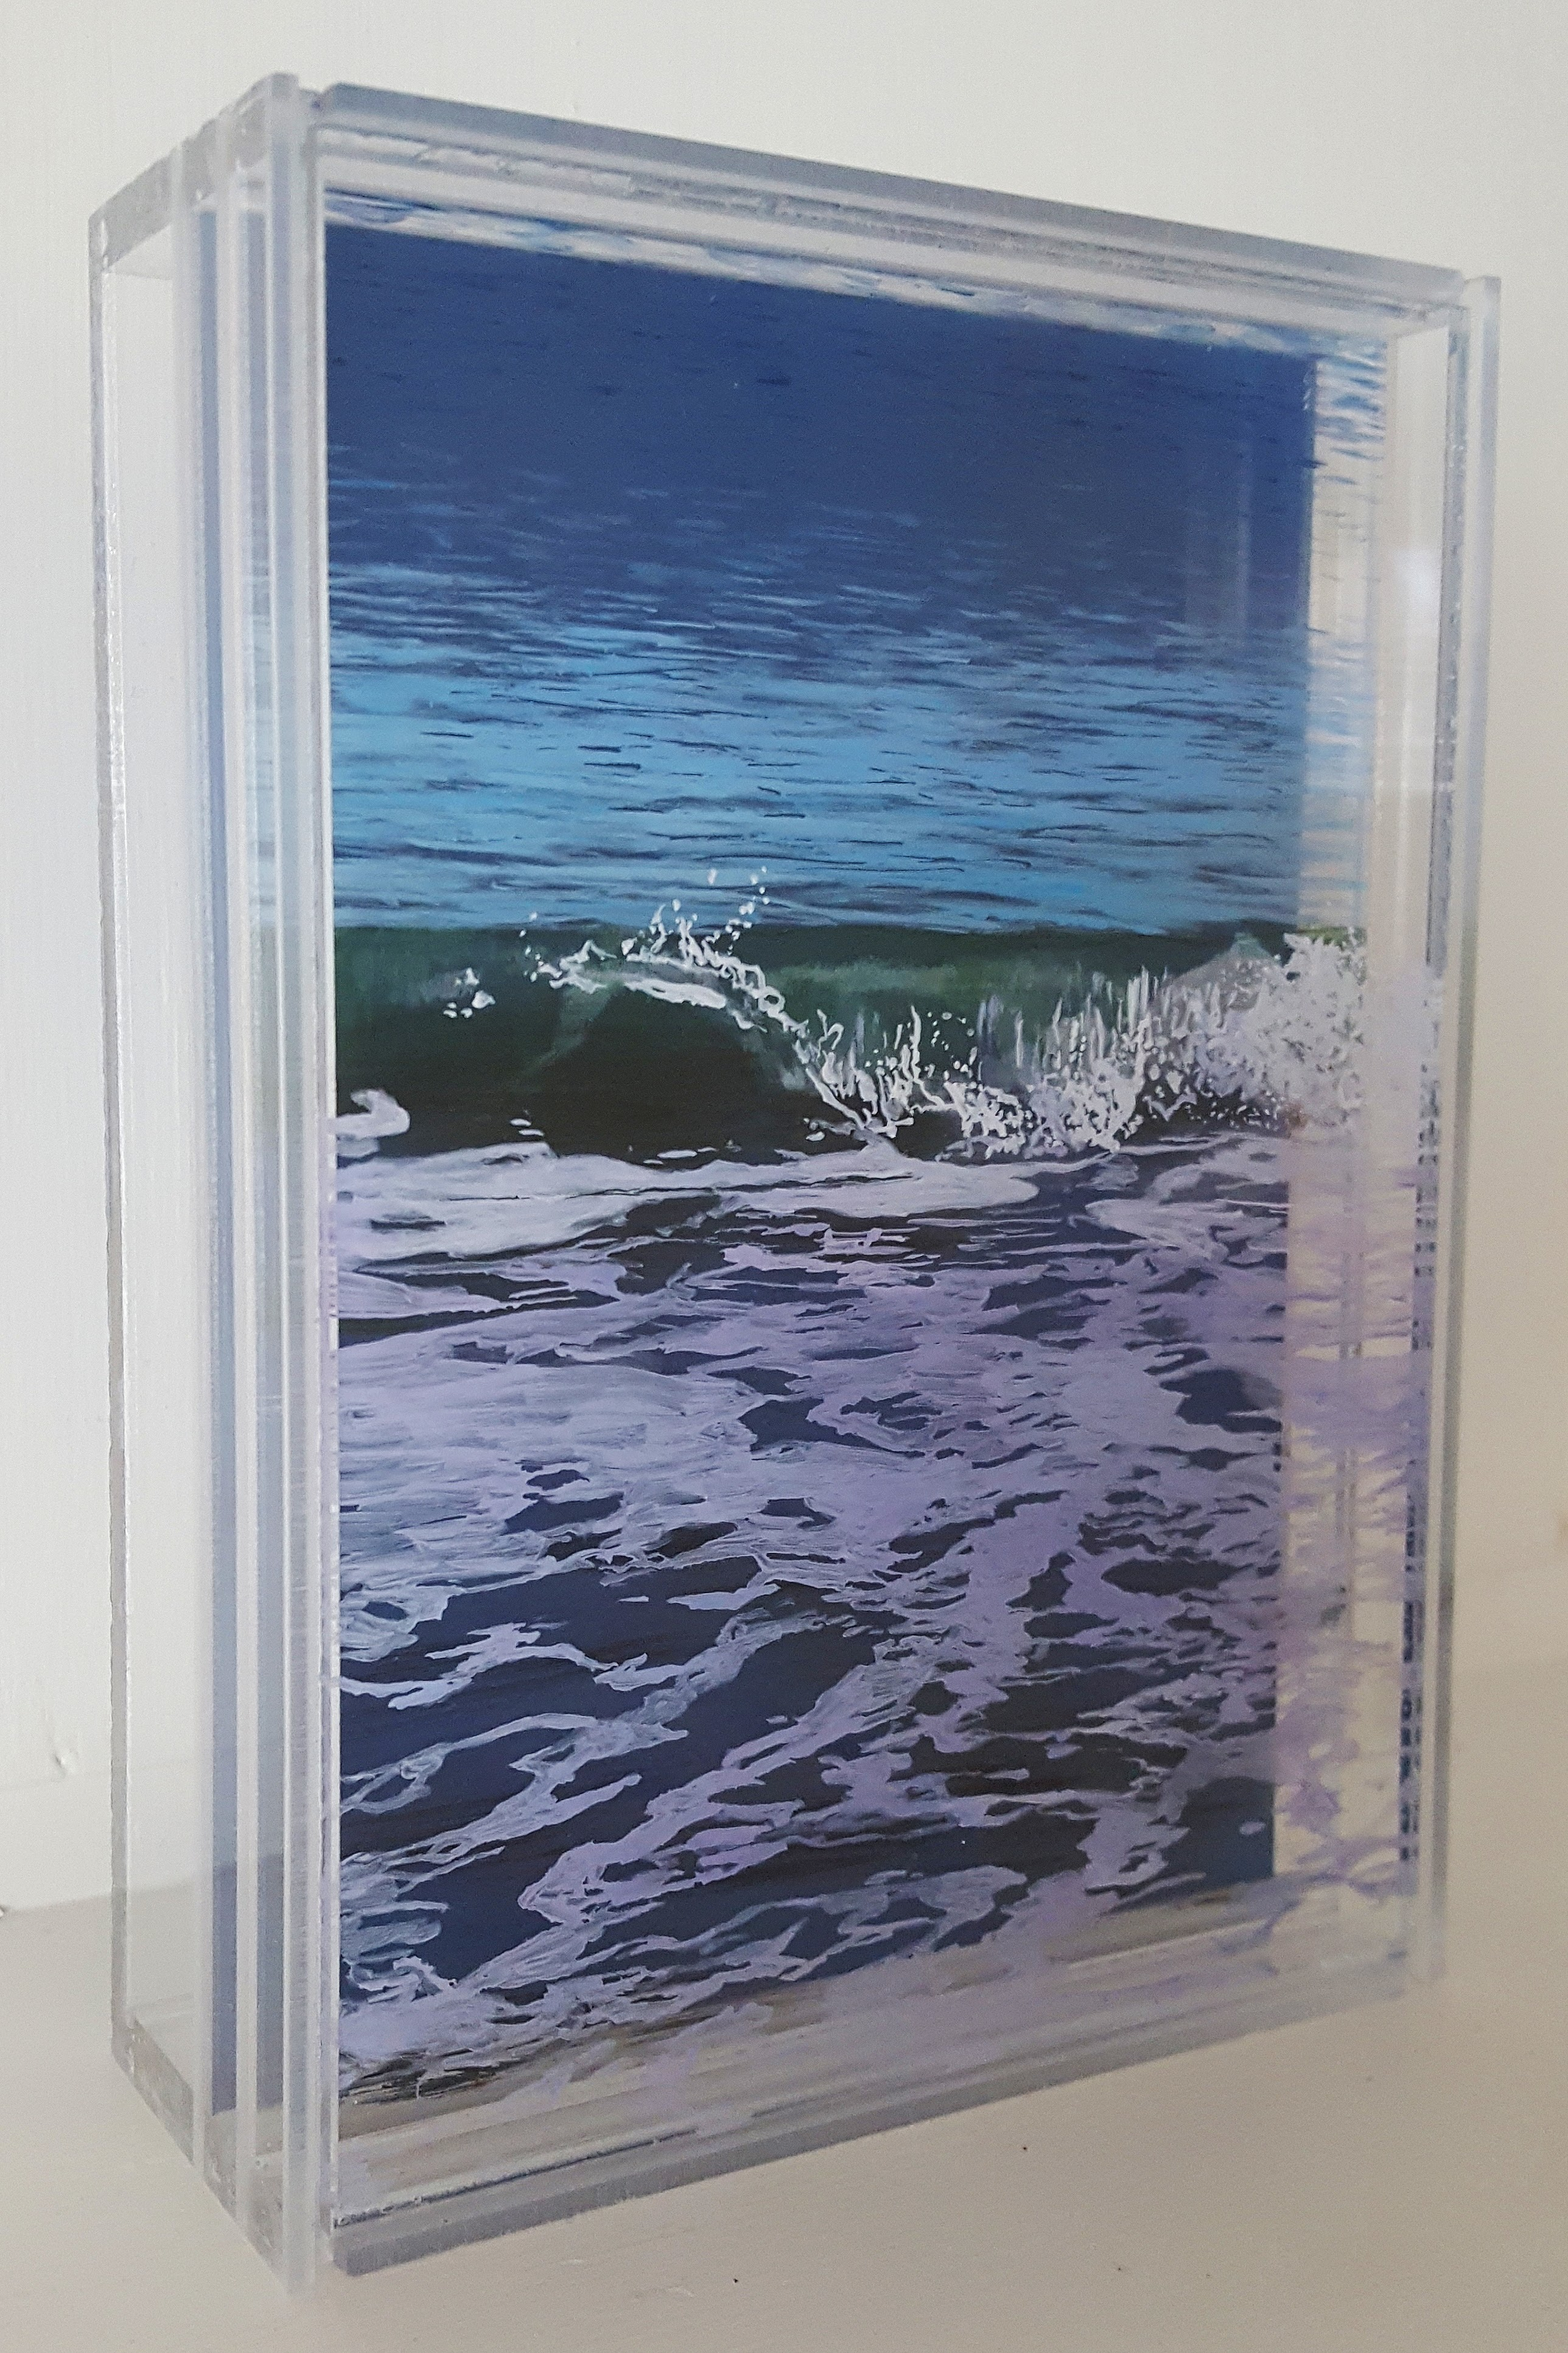 """Ebb & Flow"", 5"" x 7"", acrylic on mulitple layers of acrylic, ©Jess Hurley Scott"